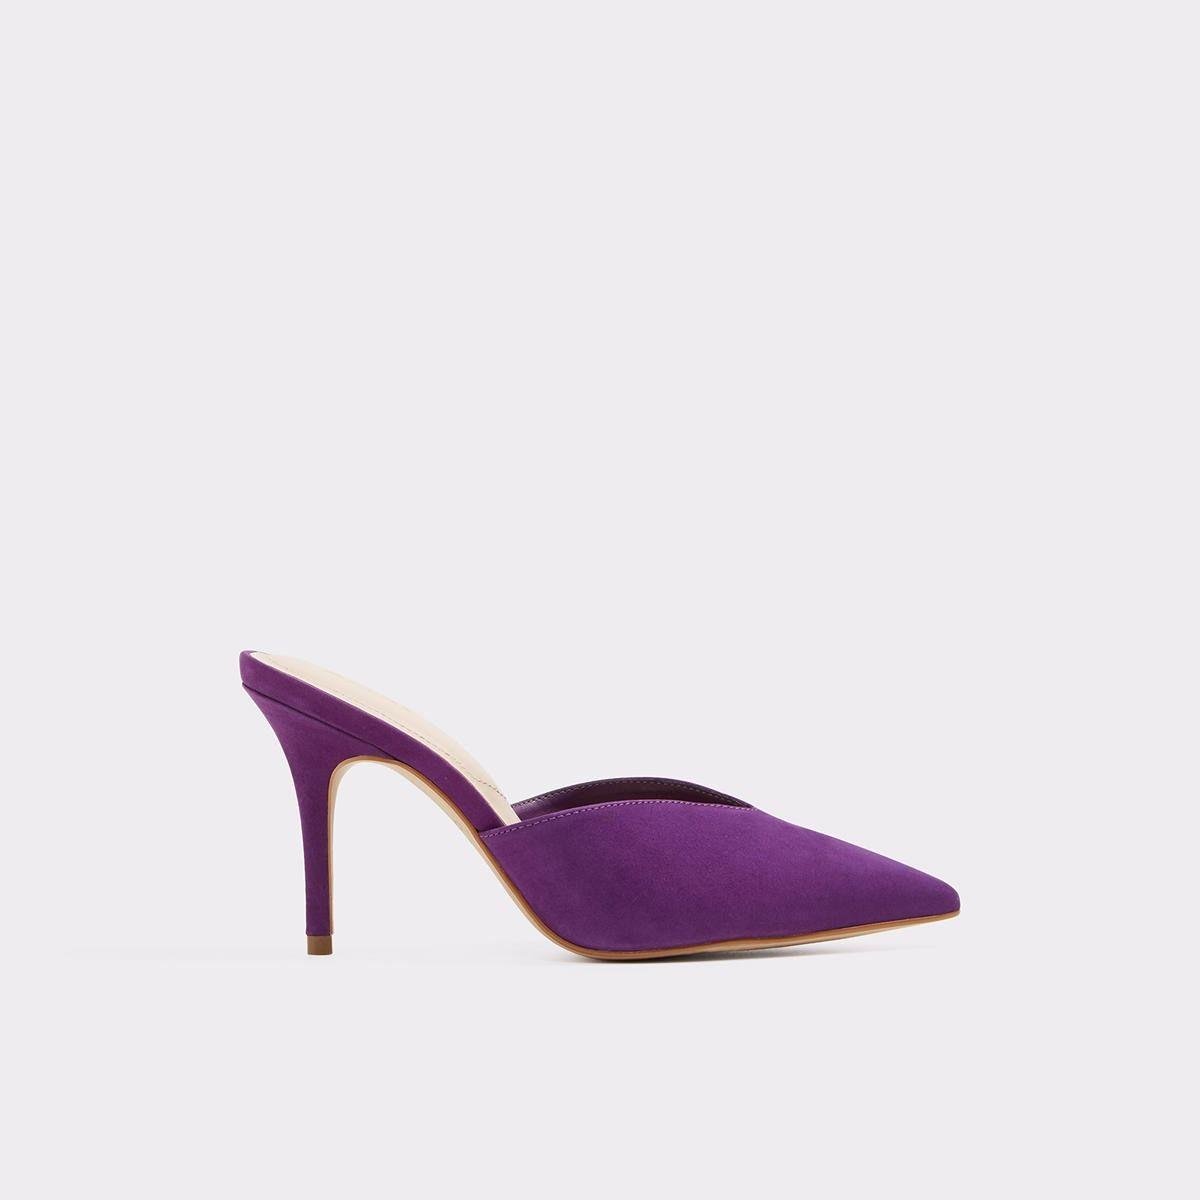 Aldo Labauve Kitten Heel Mule In Purple Heels Heels Shopping